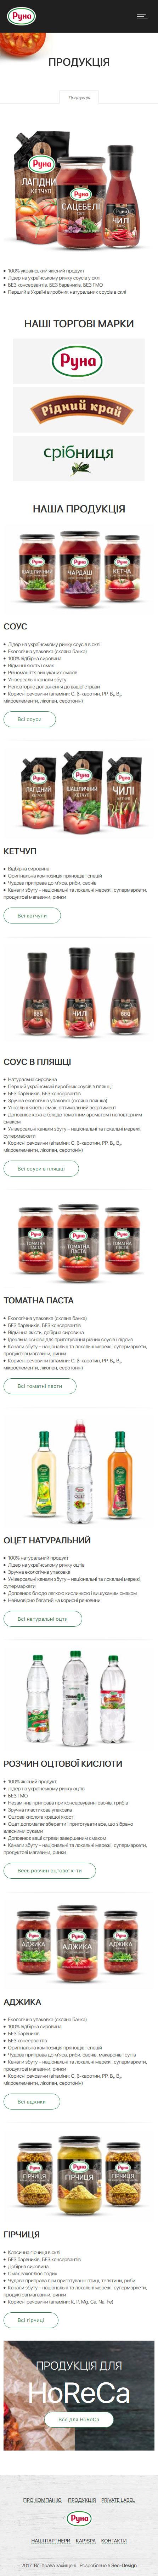 mbuk_produkciya-2